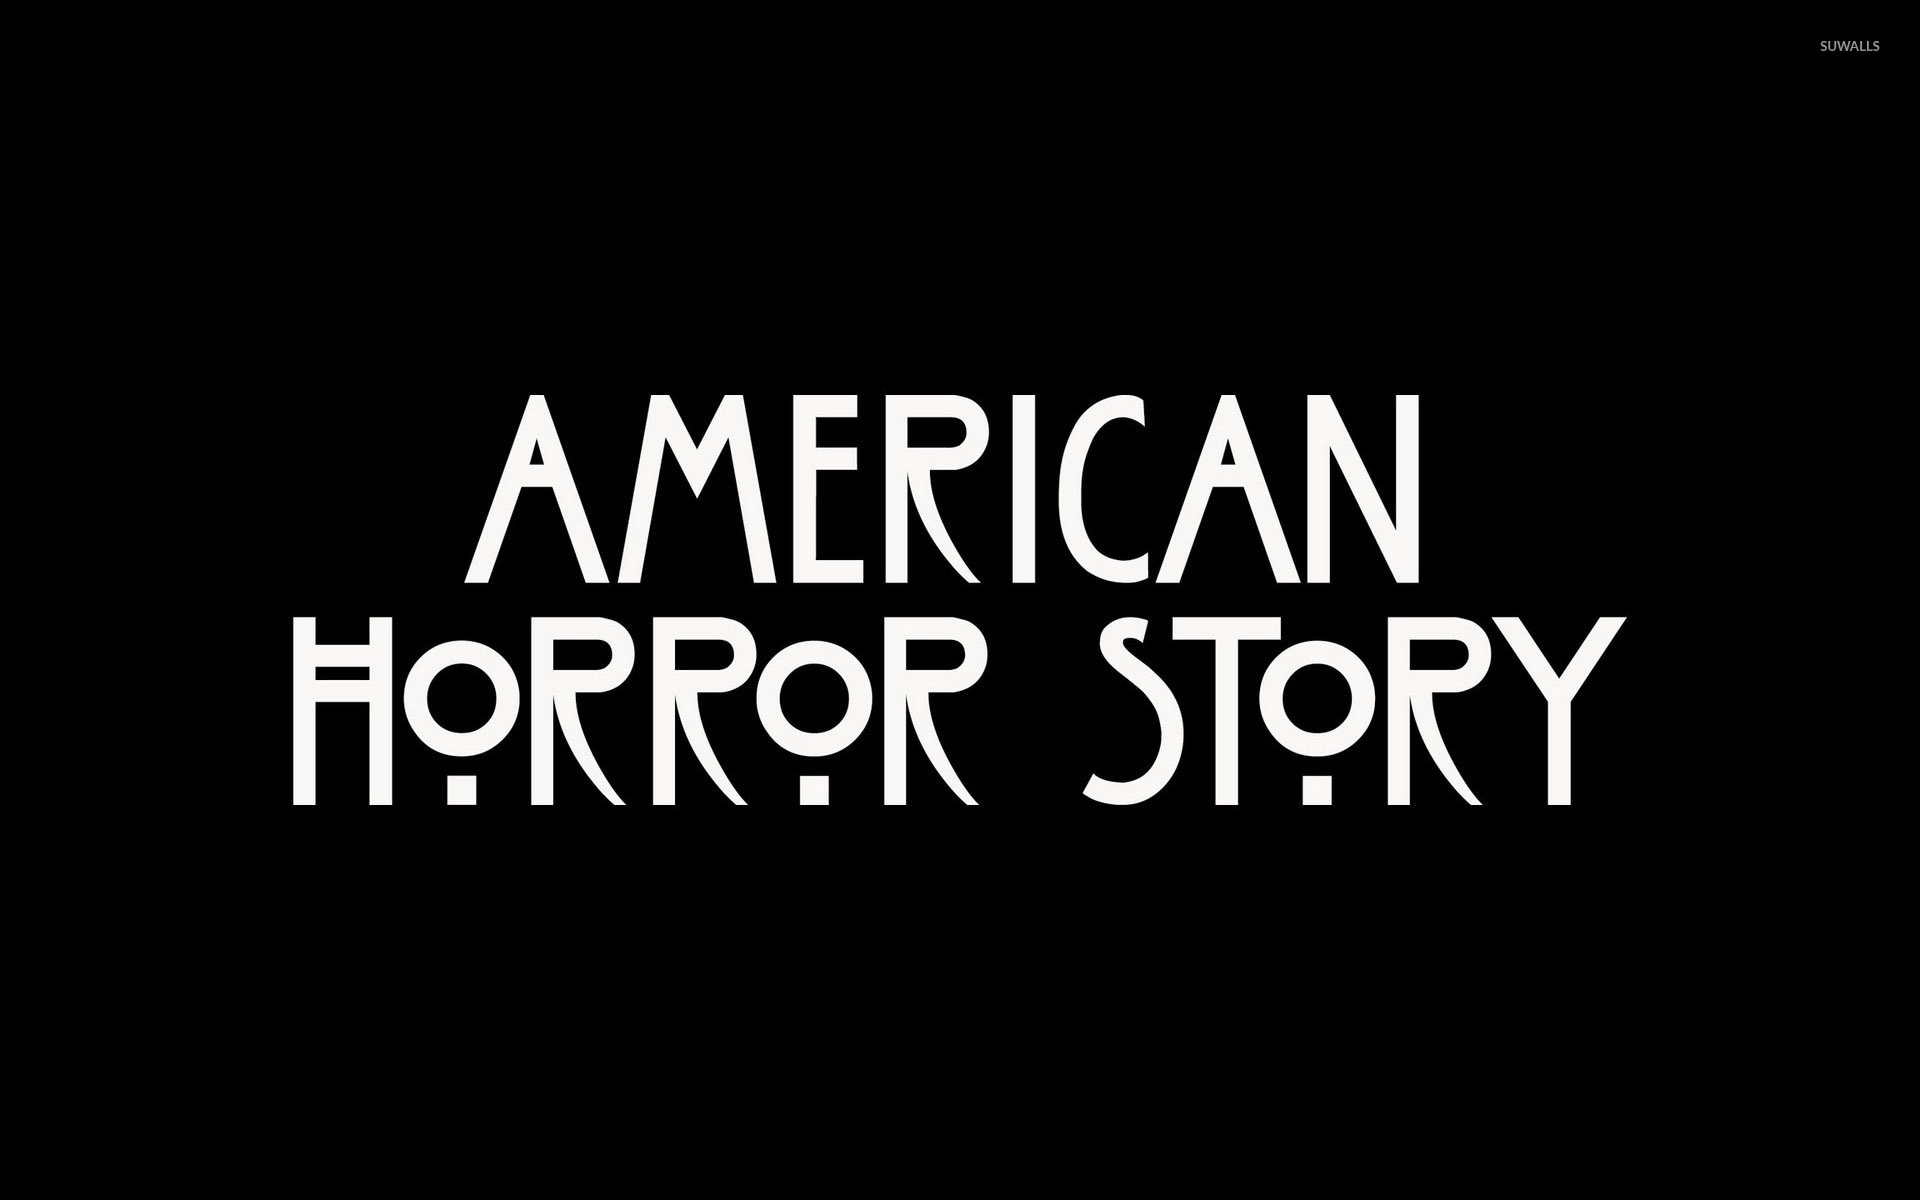 American Horror Story - Asylum wallpaper - TV Show wallpapers - #27970